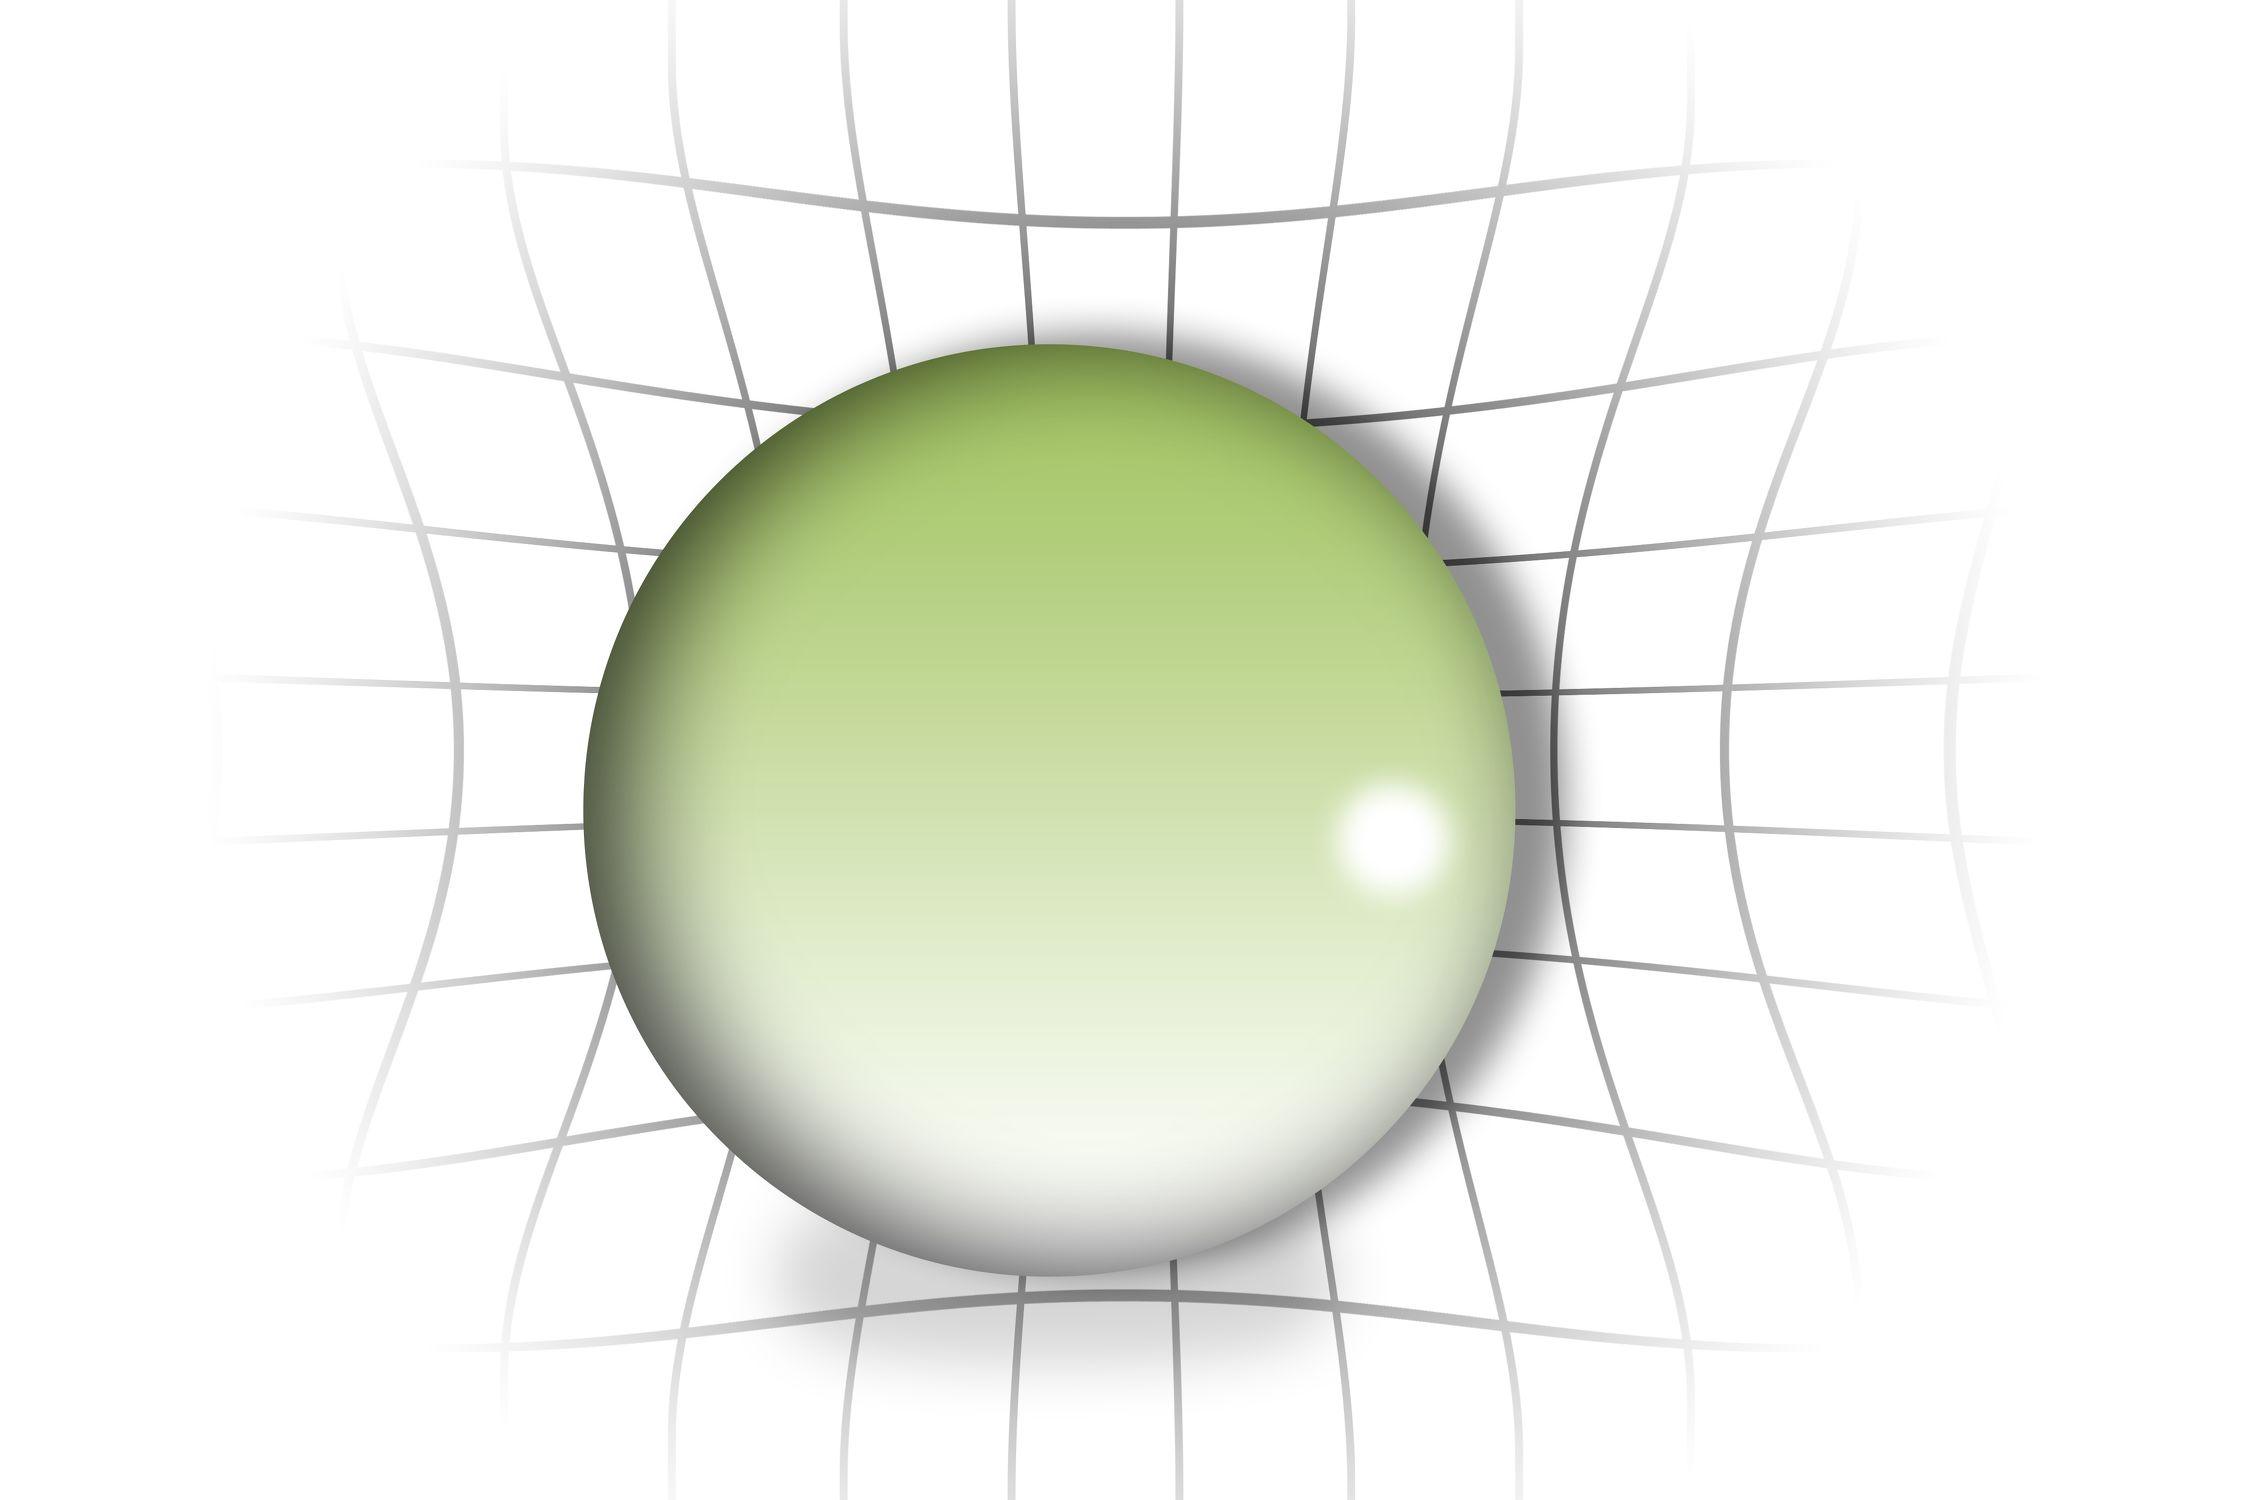 Bild mit Farben, Grün, Malerei, Illustration, Abstrakt, Abstrakte Kunst, Abstrakte Malerei